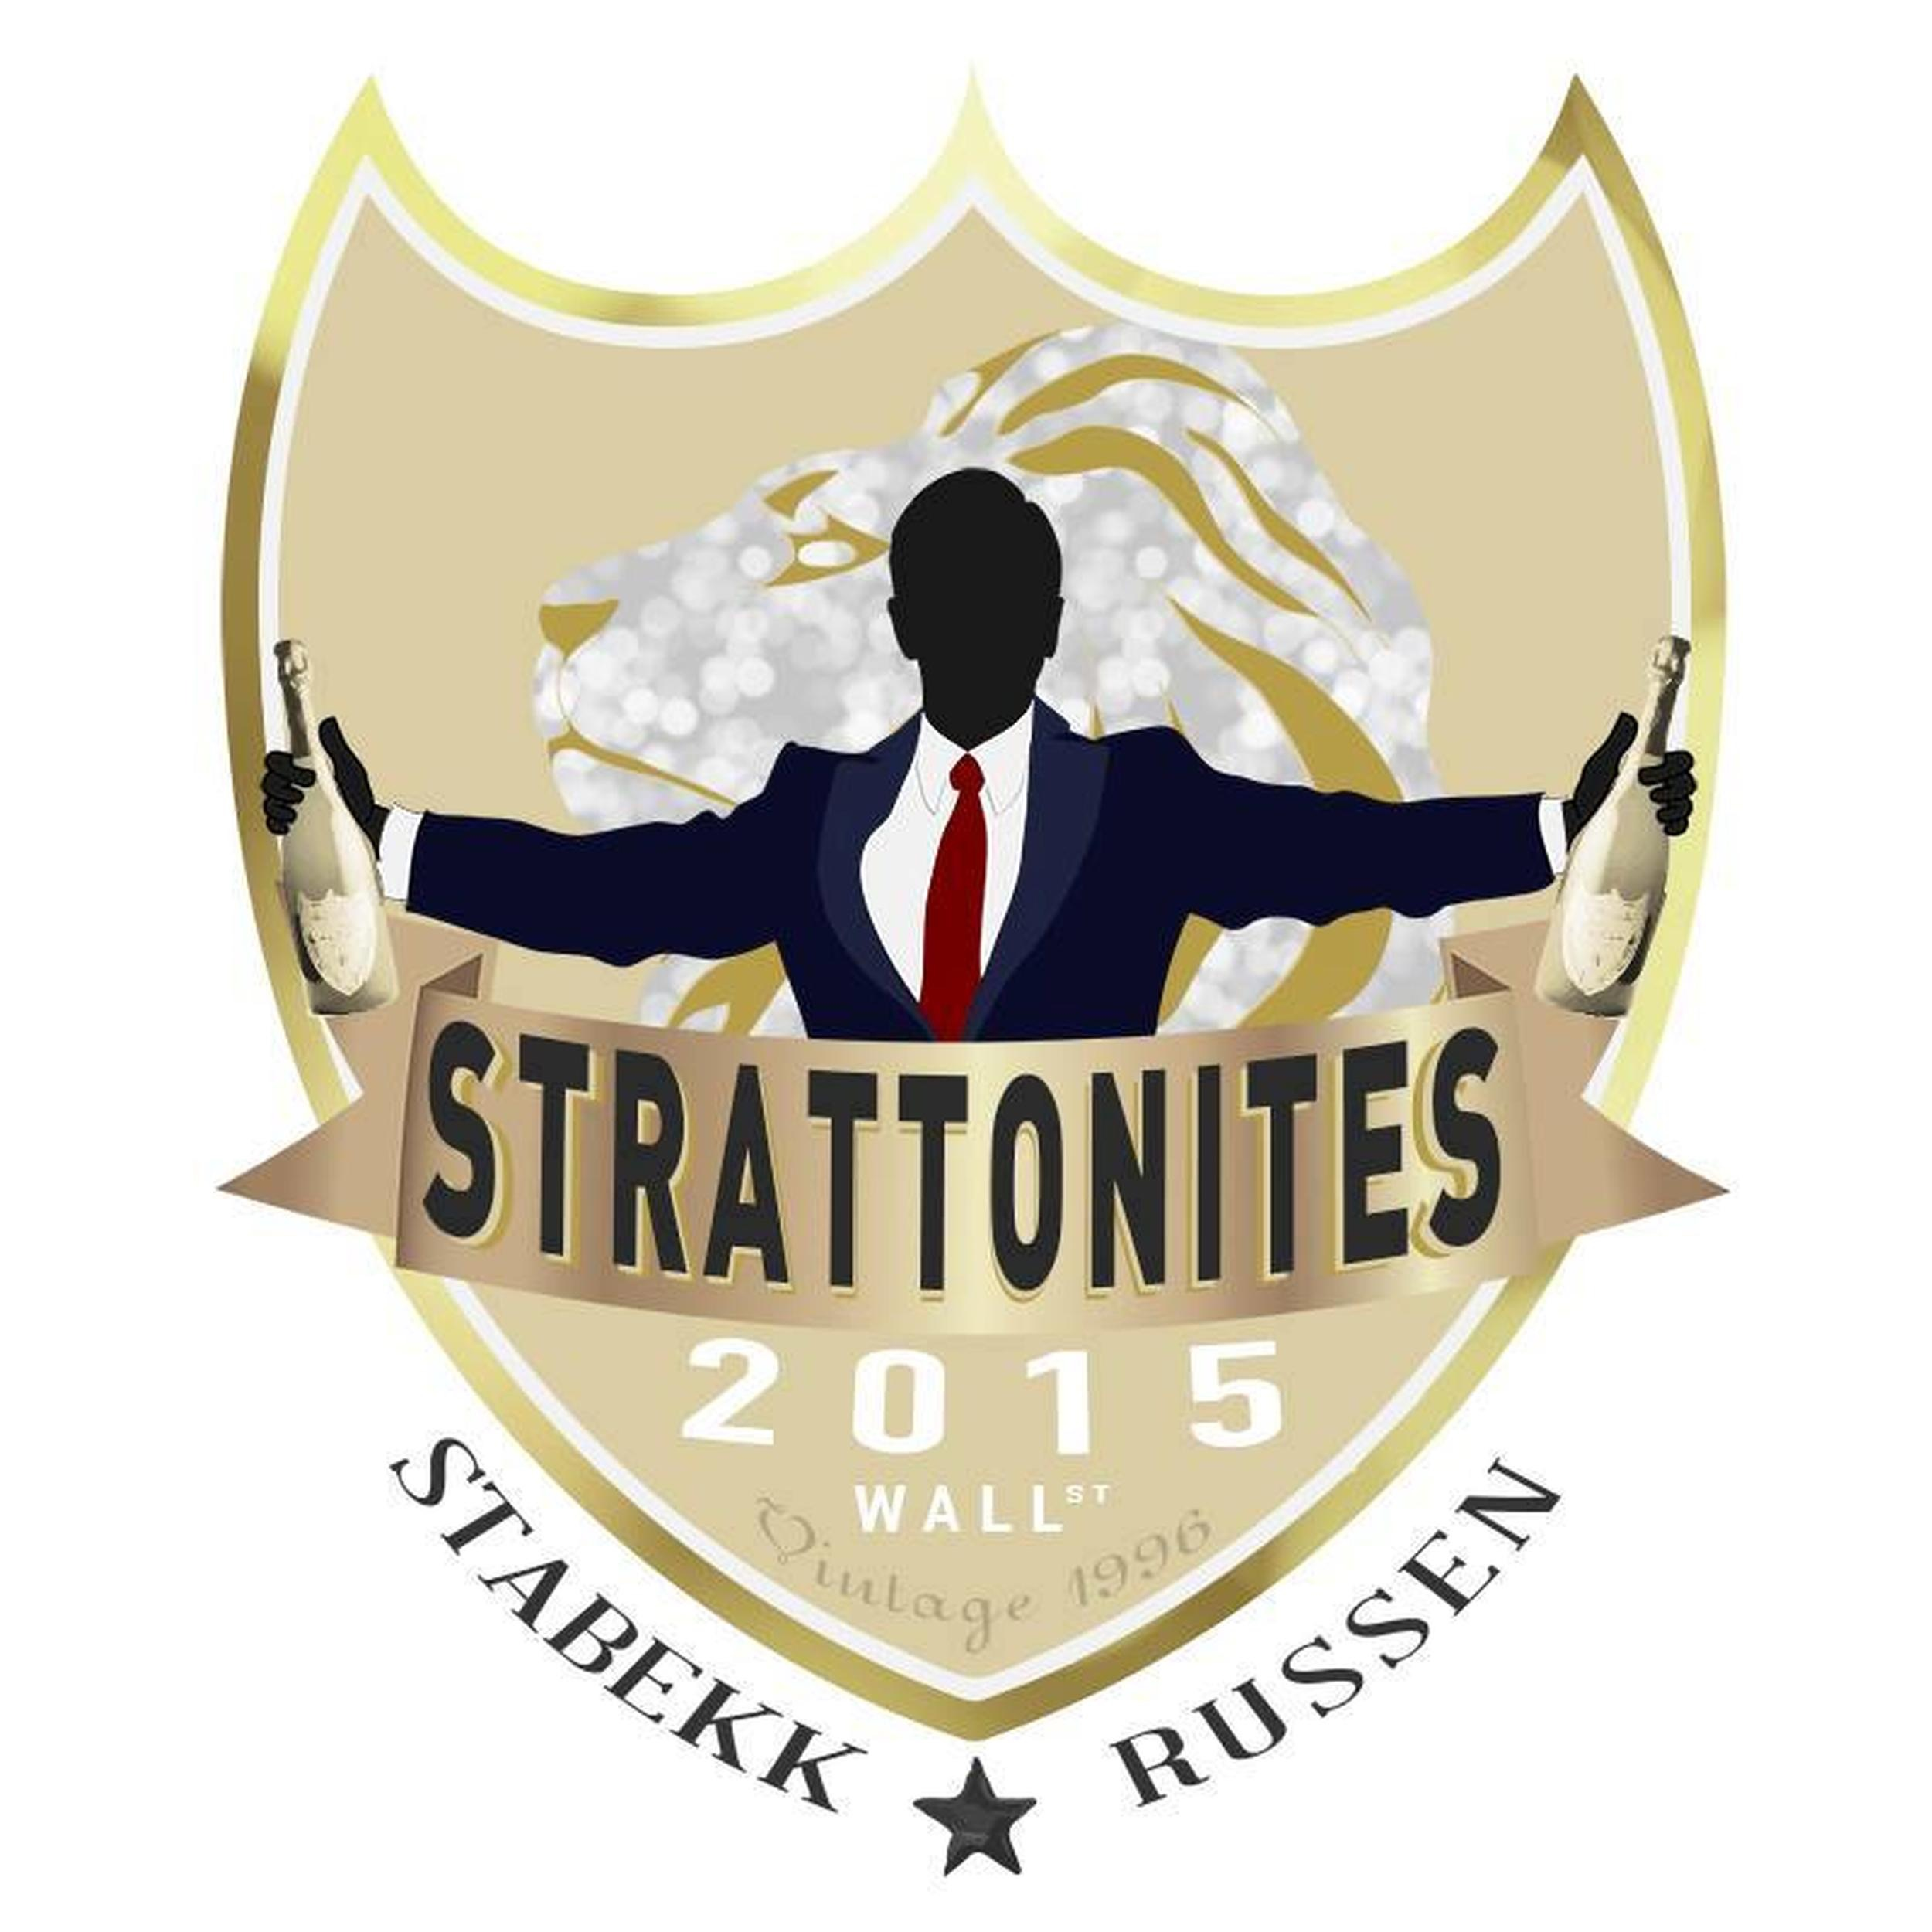 Strattonites 2015 - Single